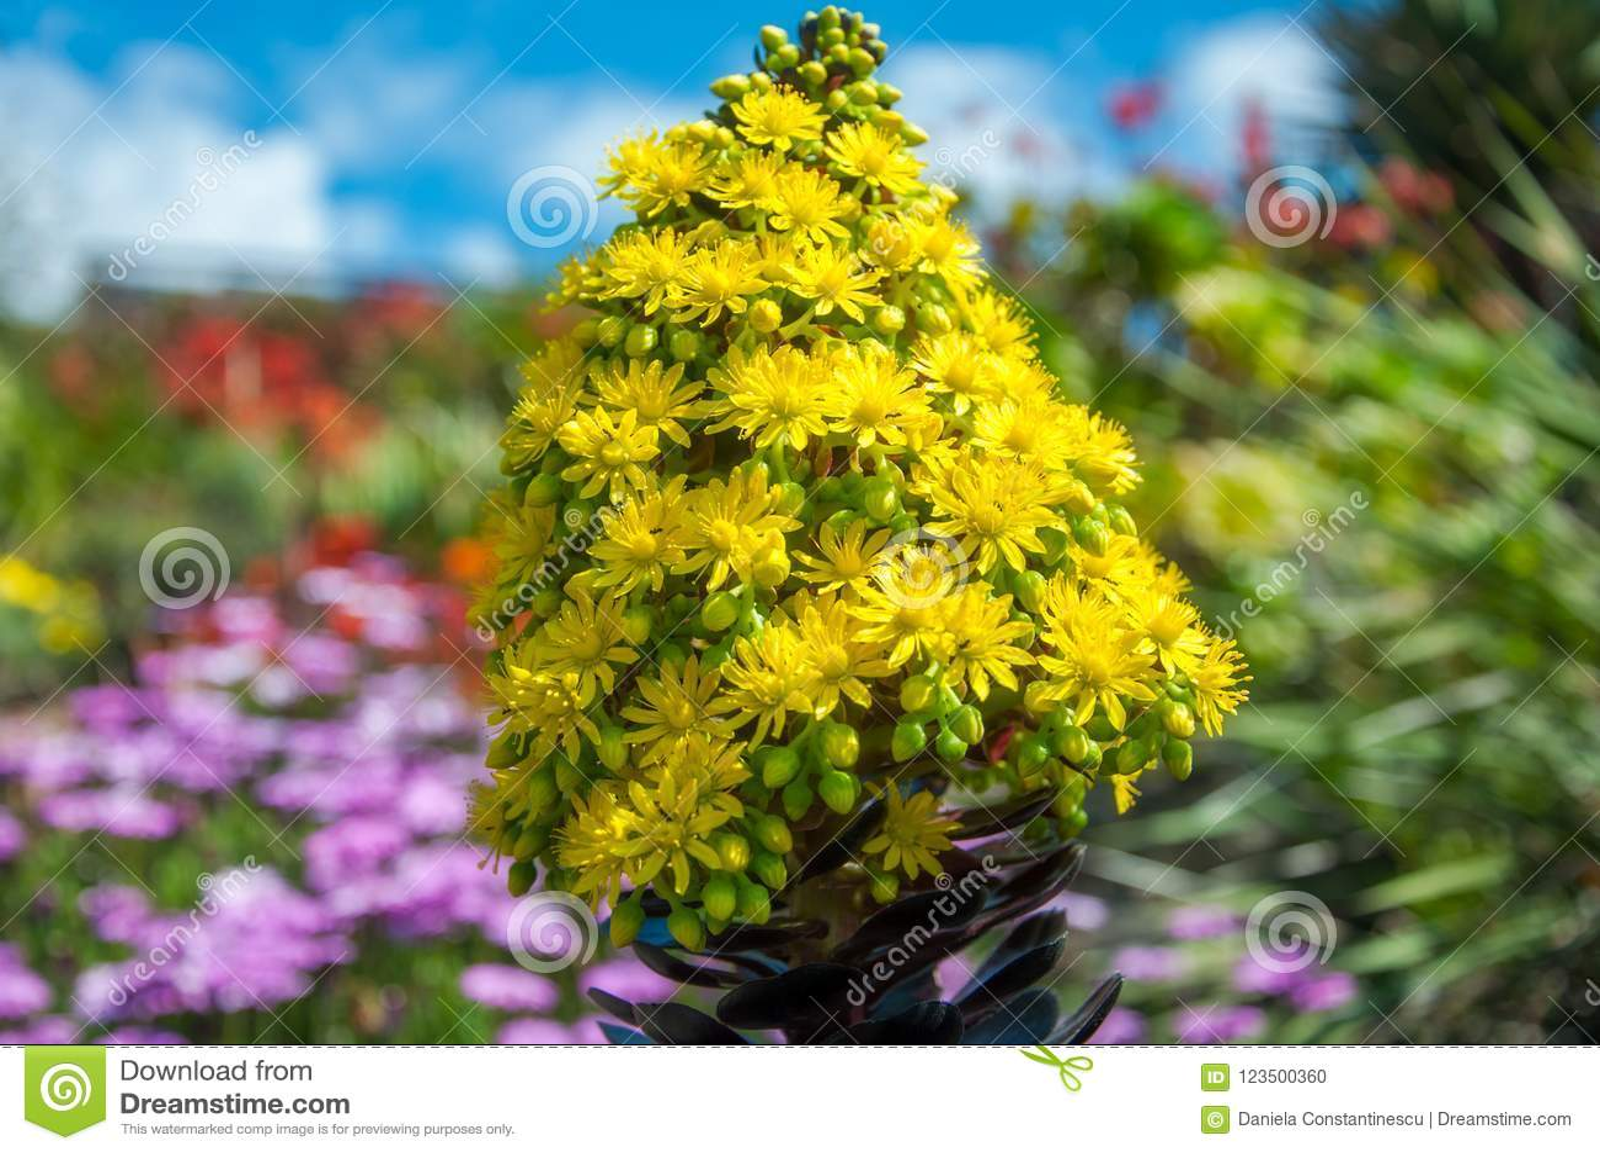 Yellow cone like flowers of the houseleek tree stock photo image download yellow cone like flowers of the houseleek tree stock photo image of australia mightylinksfo